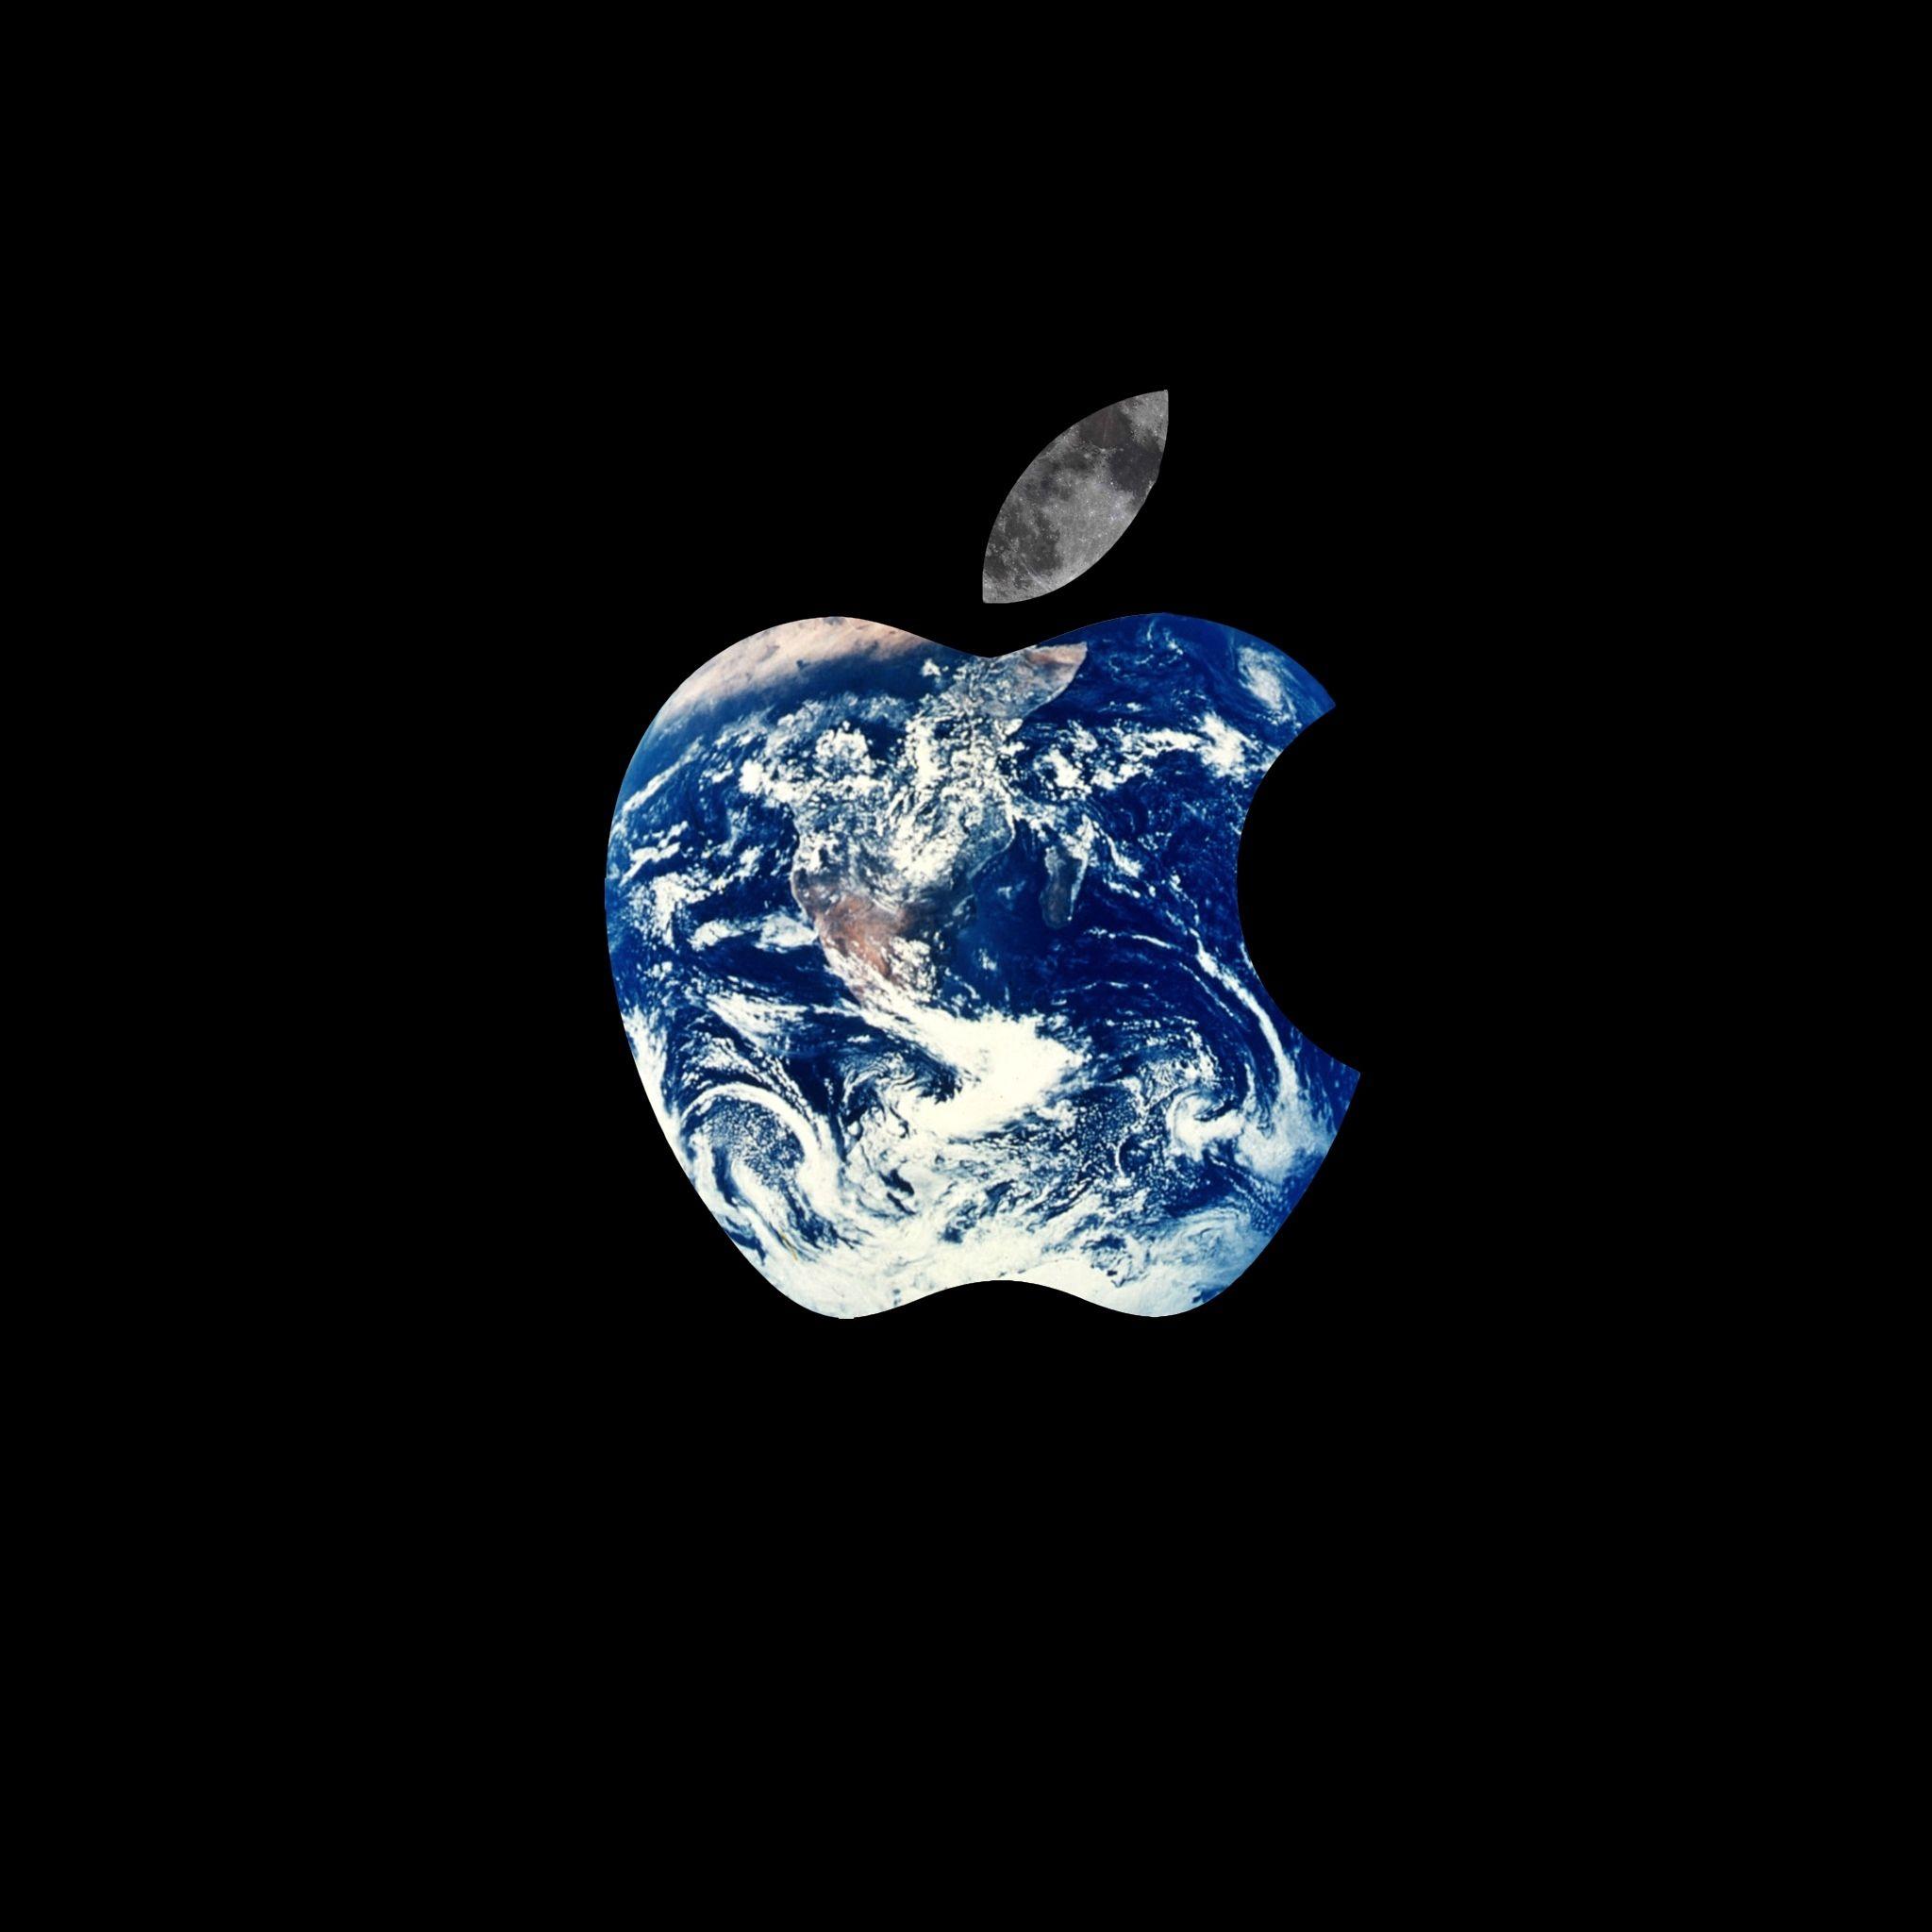 Earth Apple Logo iPad Wallpaper HD iPad wallpaper